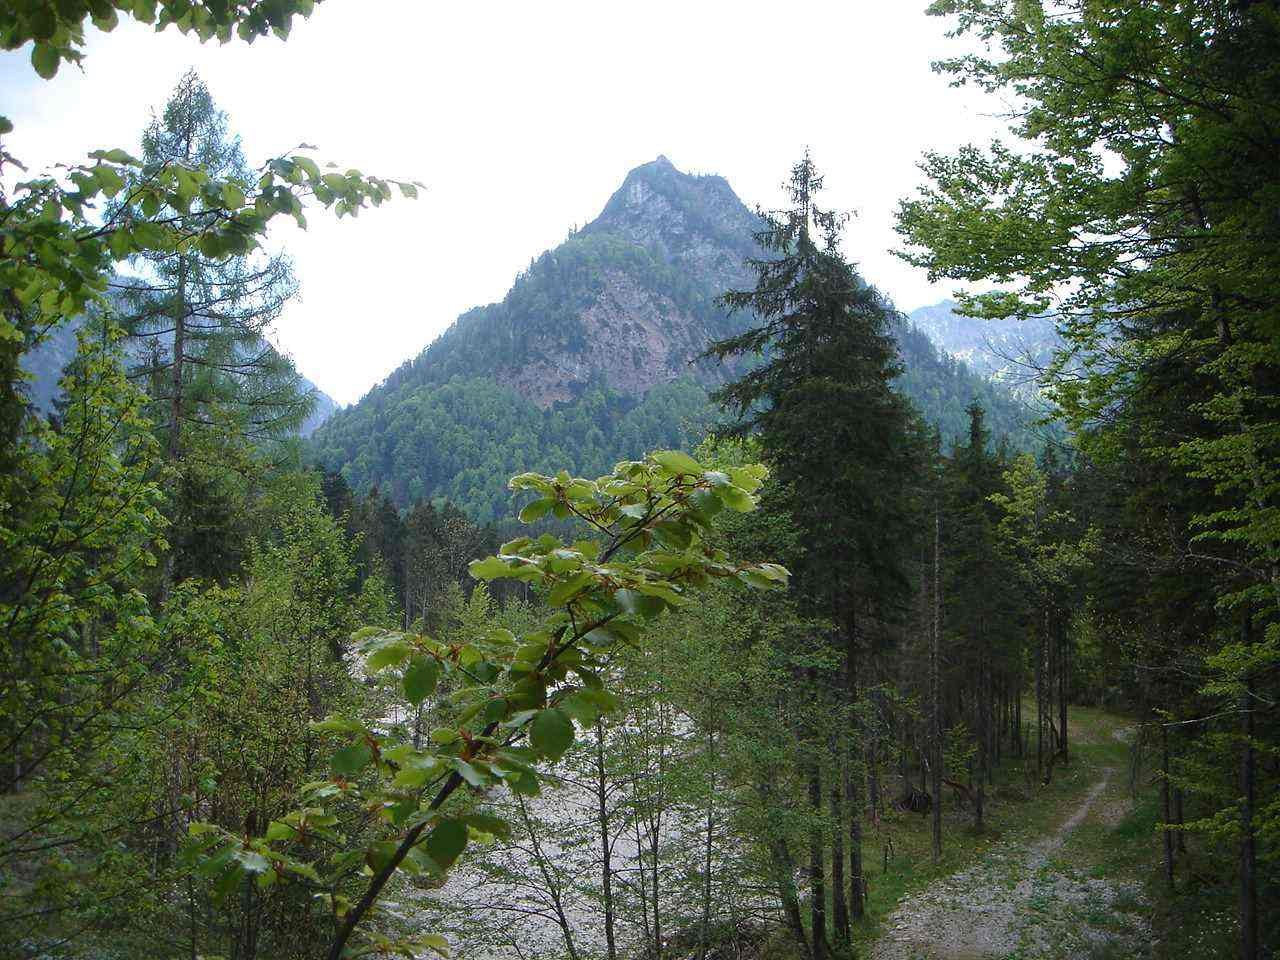 Foto: Manfred Karl / Mountainbike Tour / Saurüsselkopf (1270m) / Saurüsselkopf / 19.06.2007 06:13:27